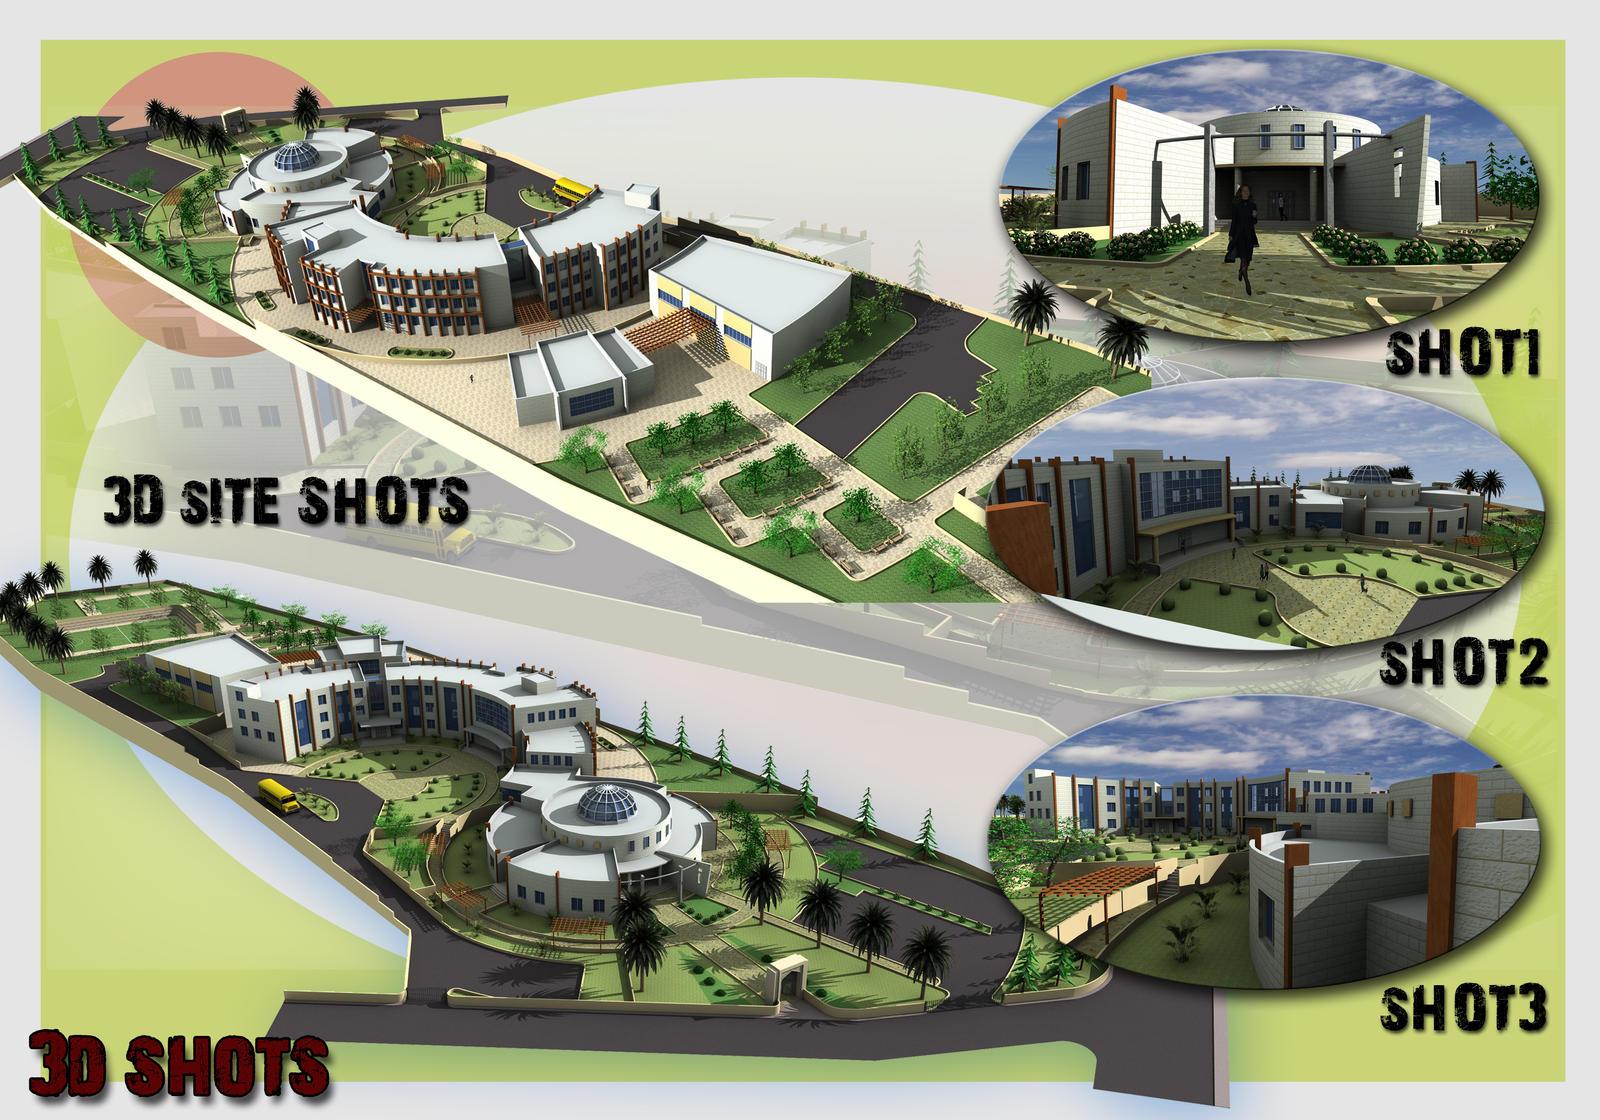 School design project by abdelmajeed school design project by abdelmajeed